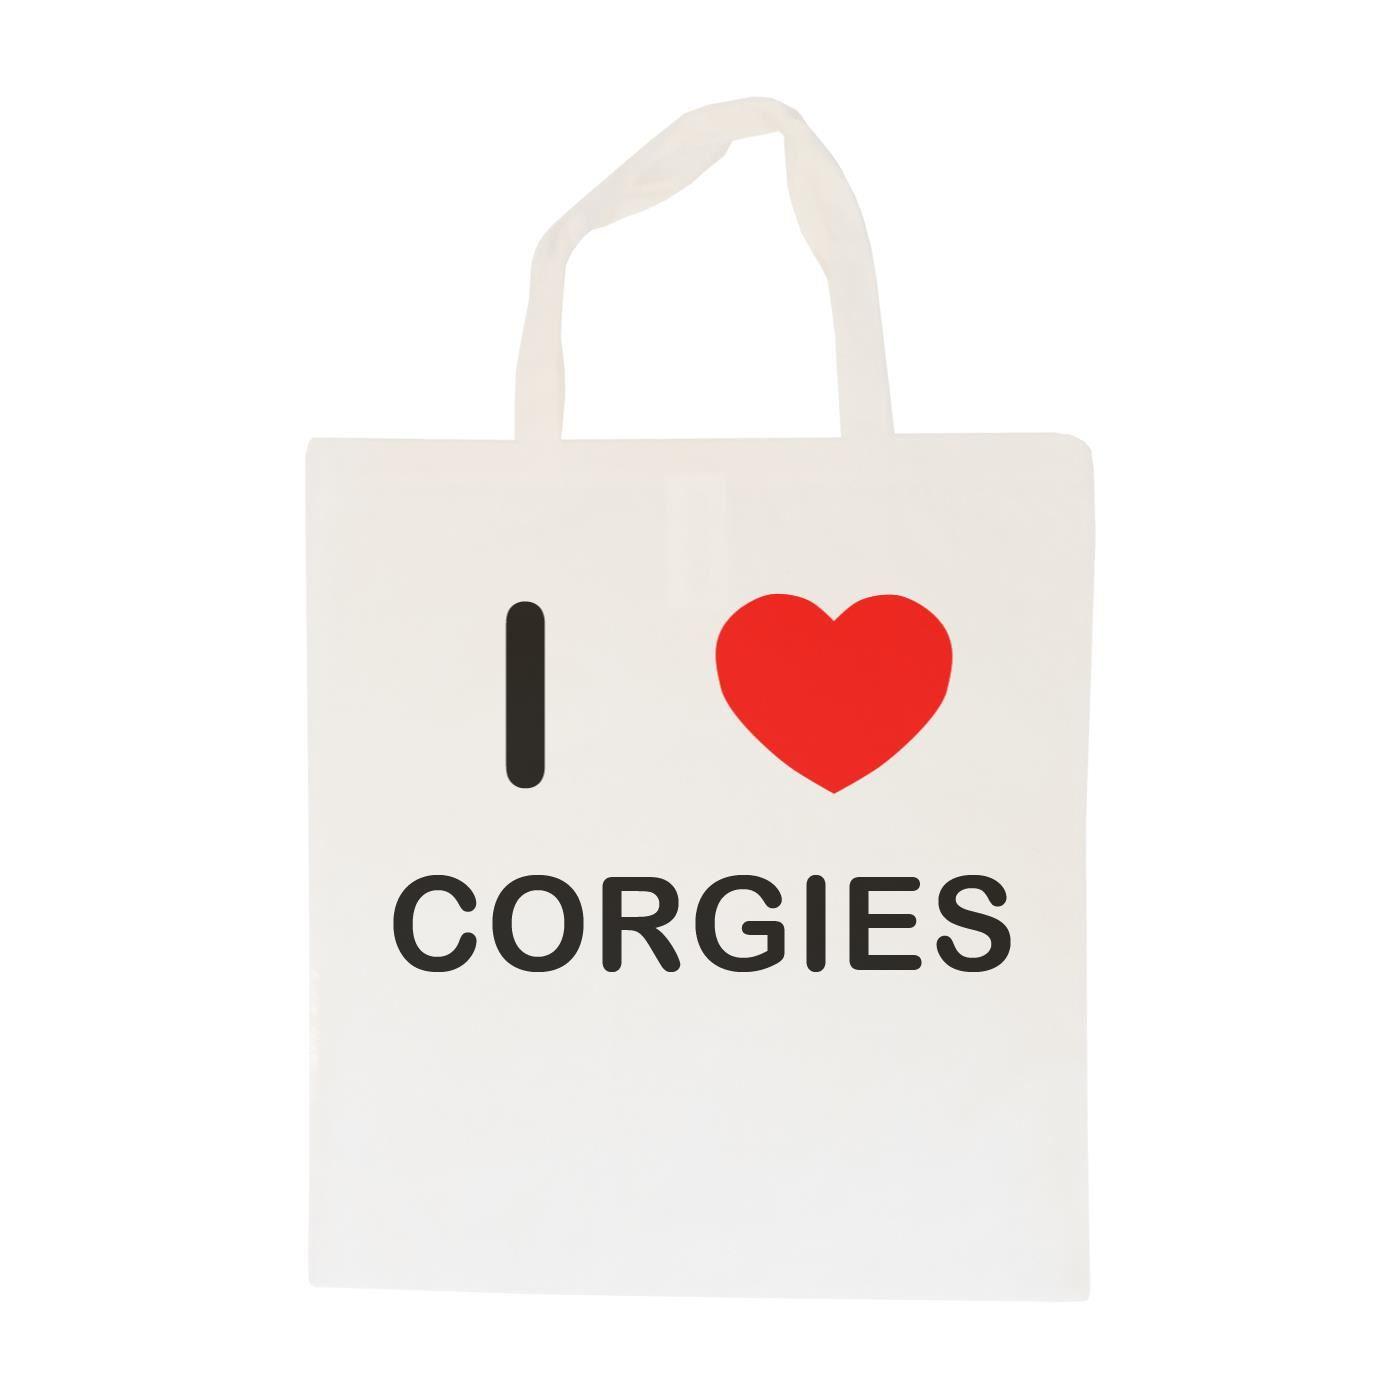 I Love Corgies - Cotton Bag | Size choice Tote, Shopper or Sling